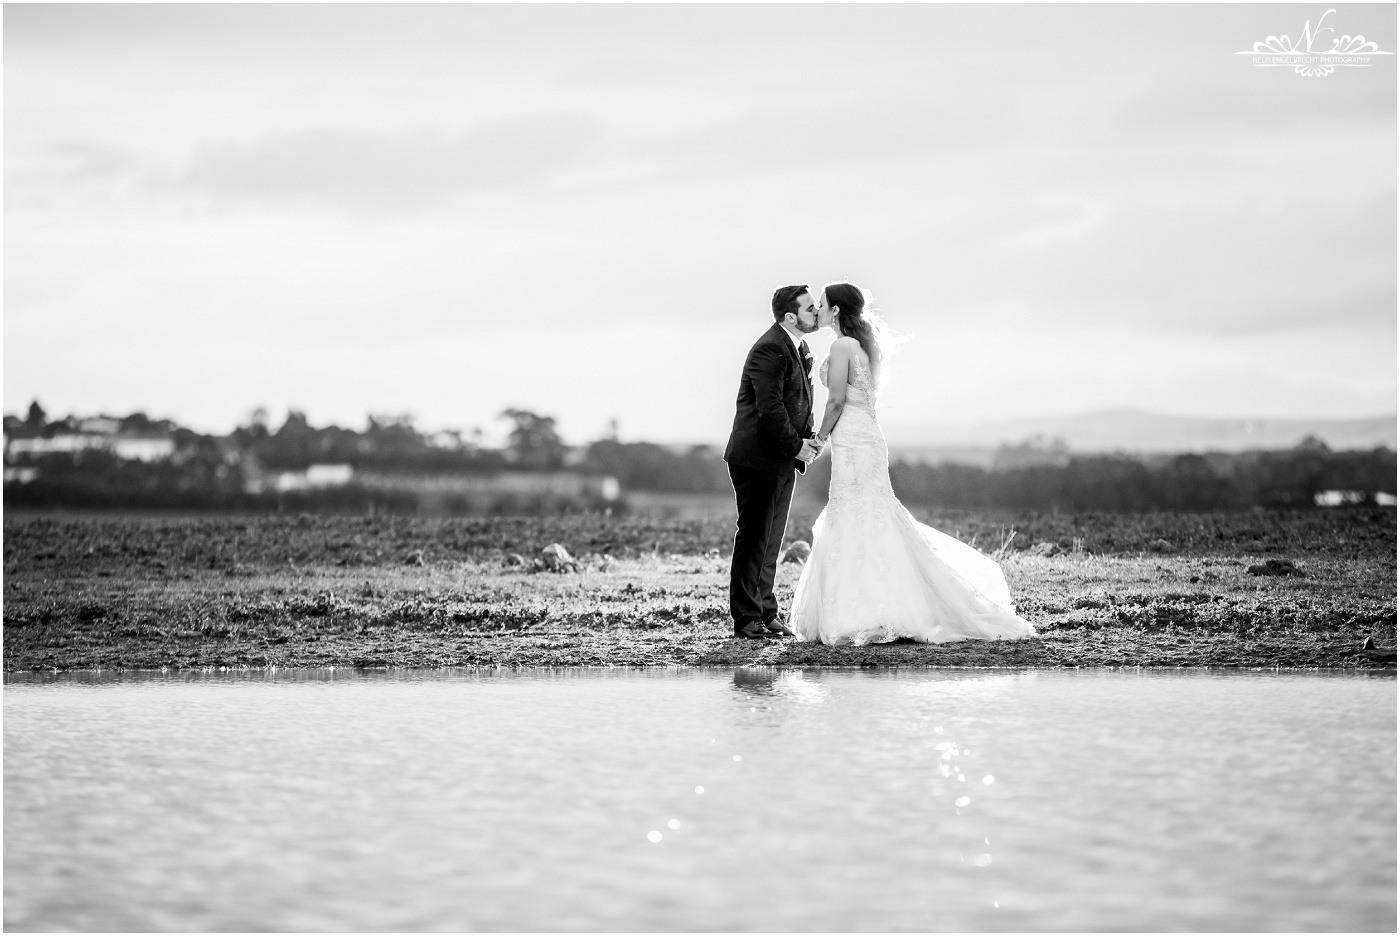 Eensgezind-Wedding-Photos-Nelis-Engelbrecht-Photography-160